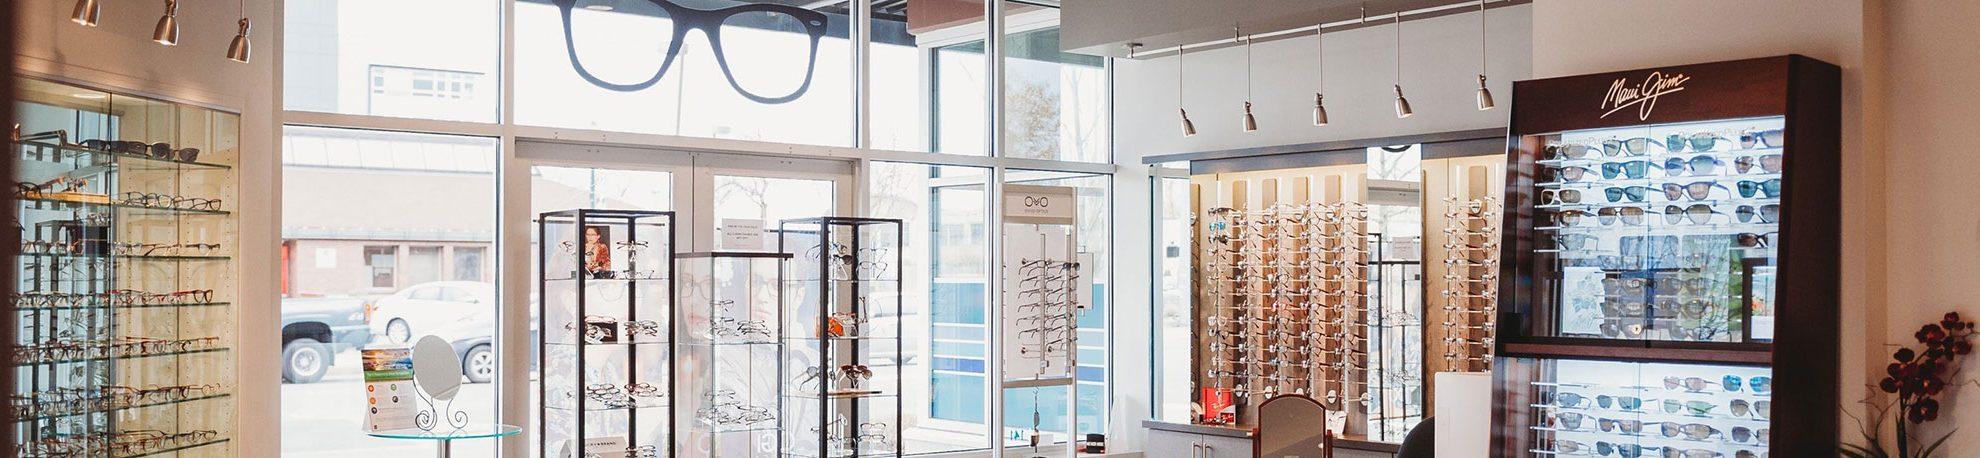 Interior of Northwest Eye Care